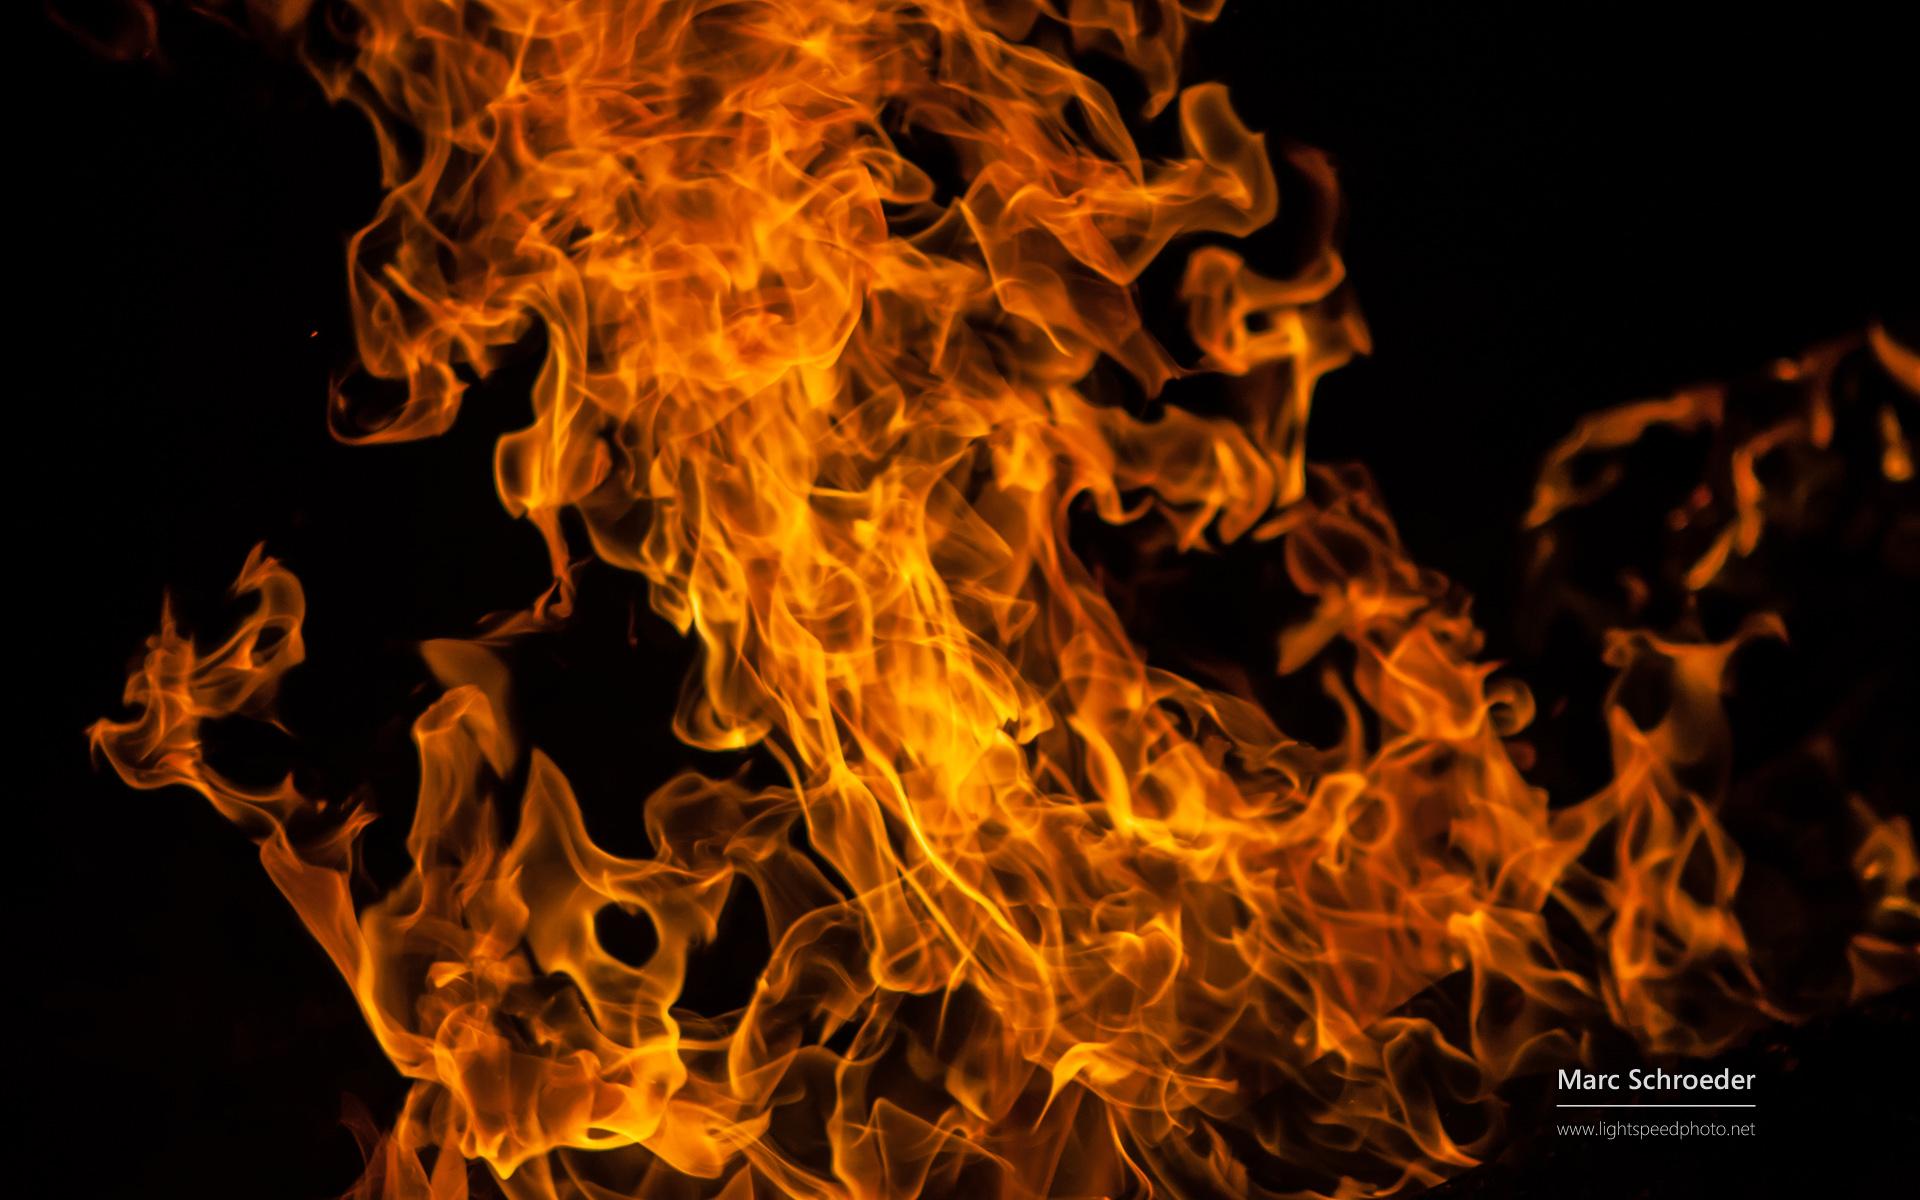 flammes-mortelles